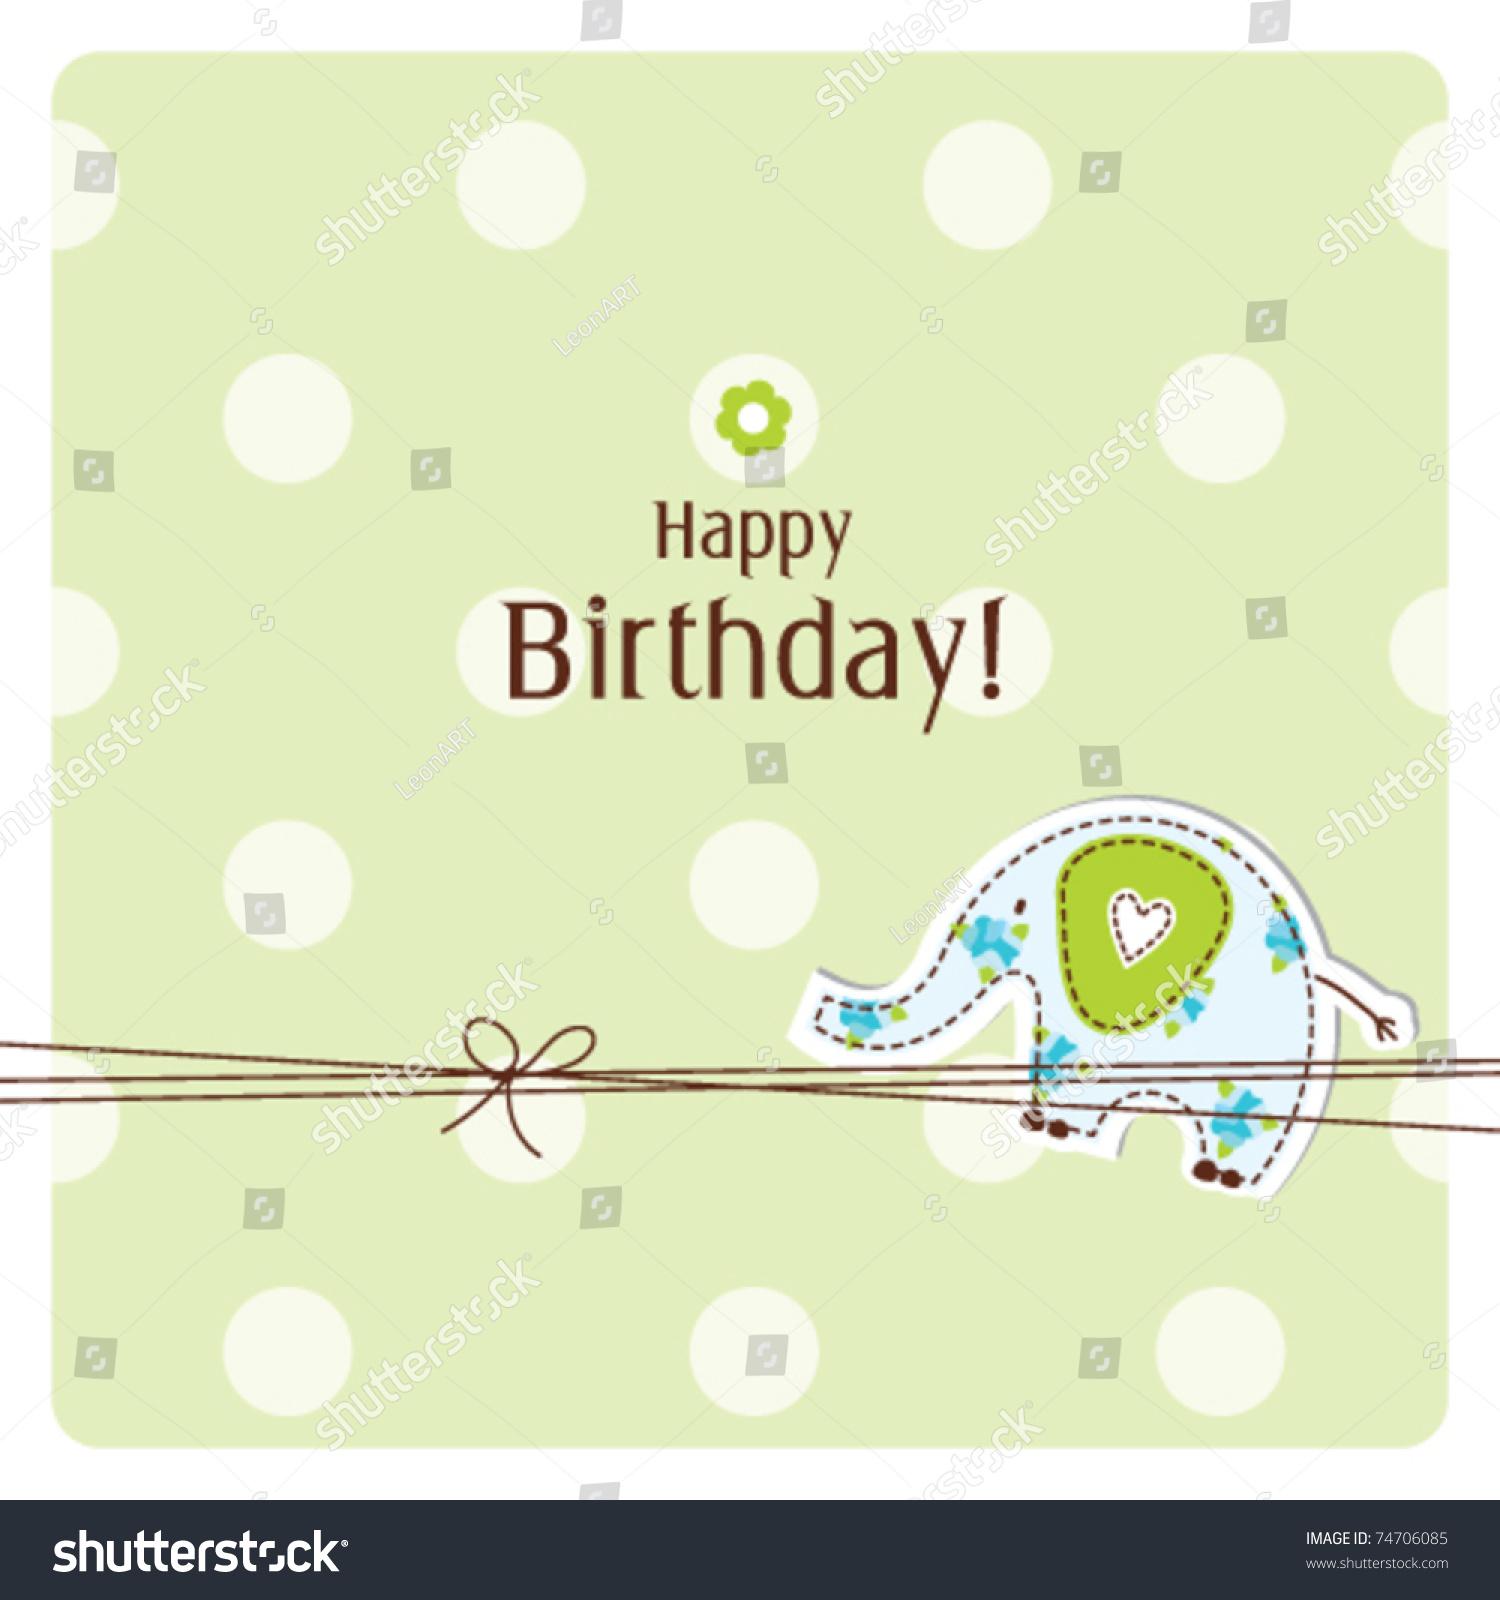 Doc425425 Birthday Greetings Template Happy birthday card – Birthday Greetings Template